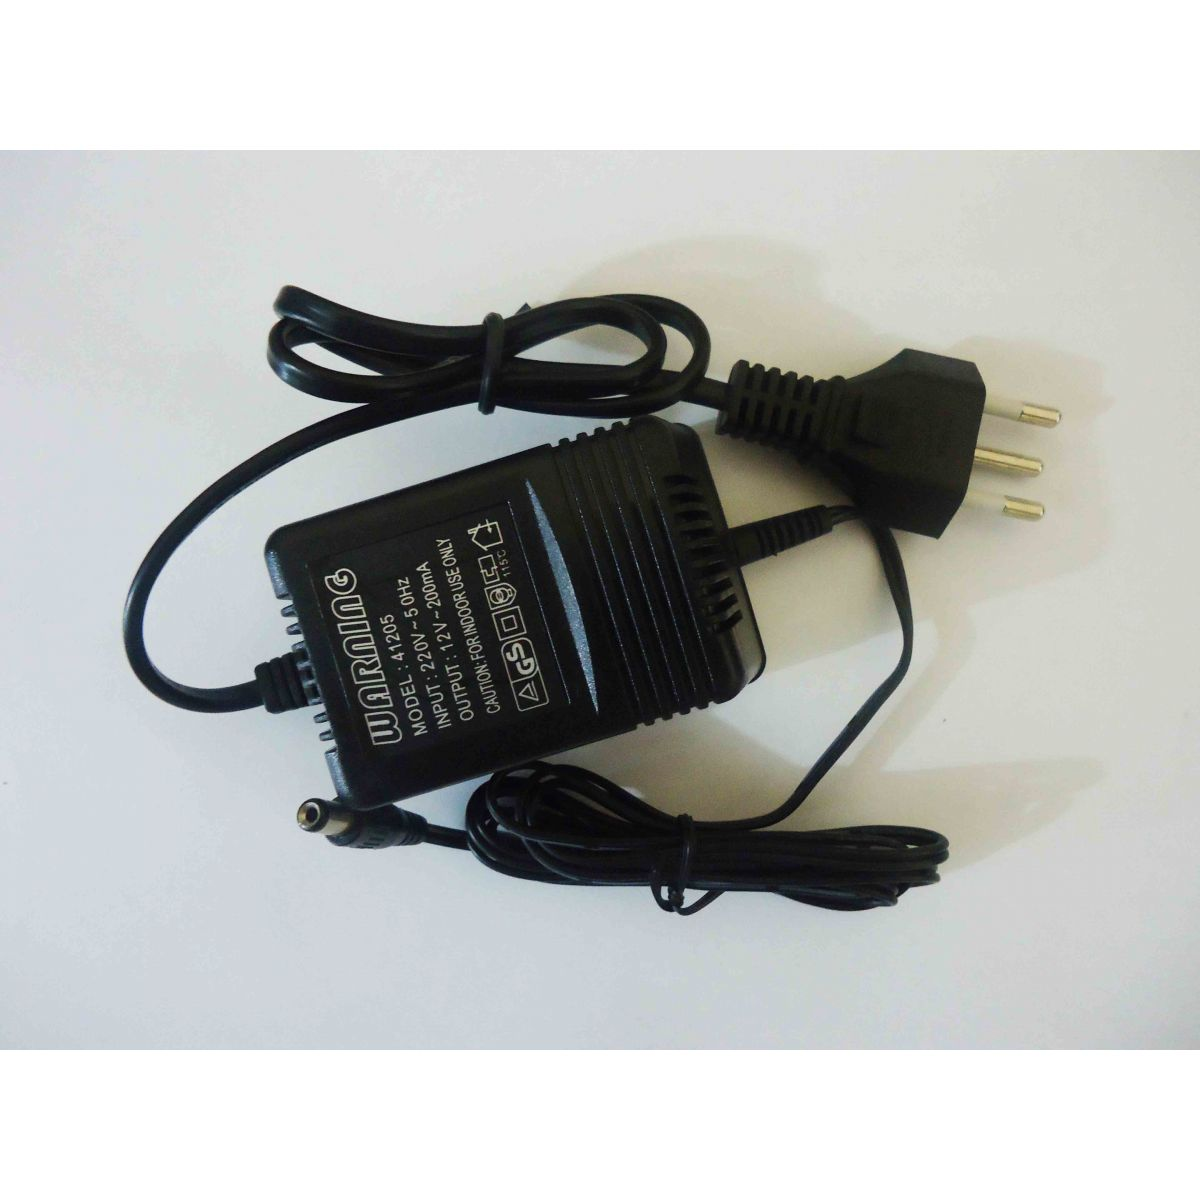 Fonte p / Microfone Warning 41205 220V 12v 200mA